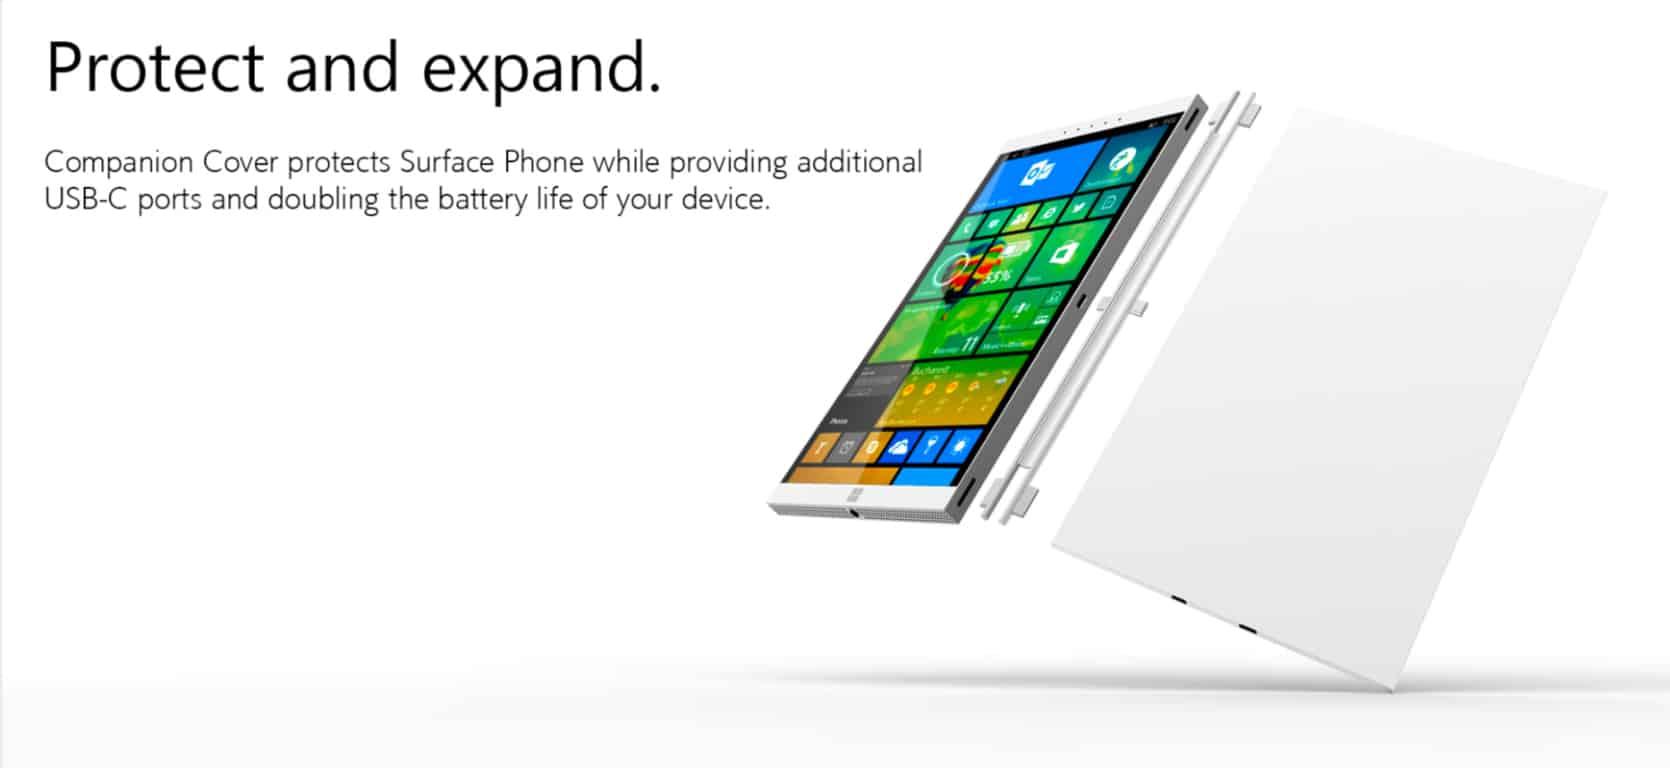 Surface Phone concept art by Casmir Valeri